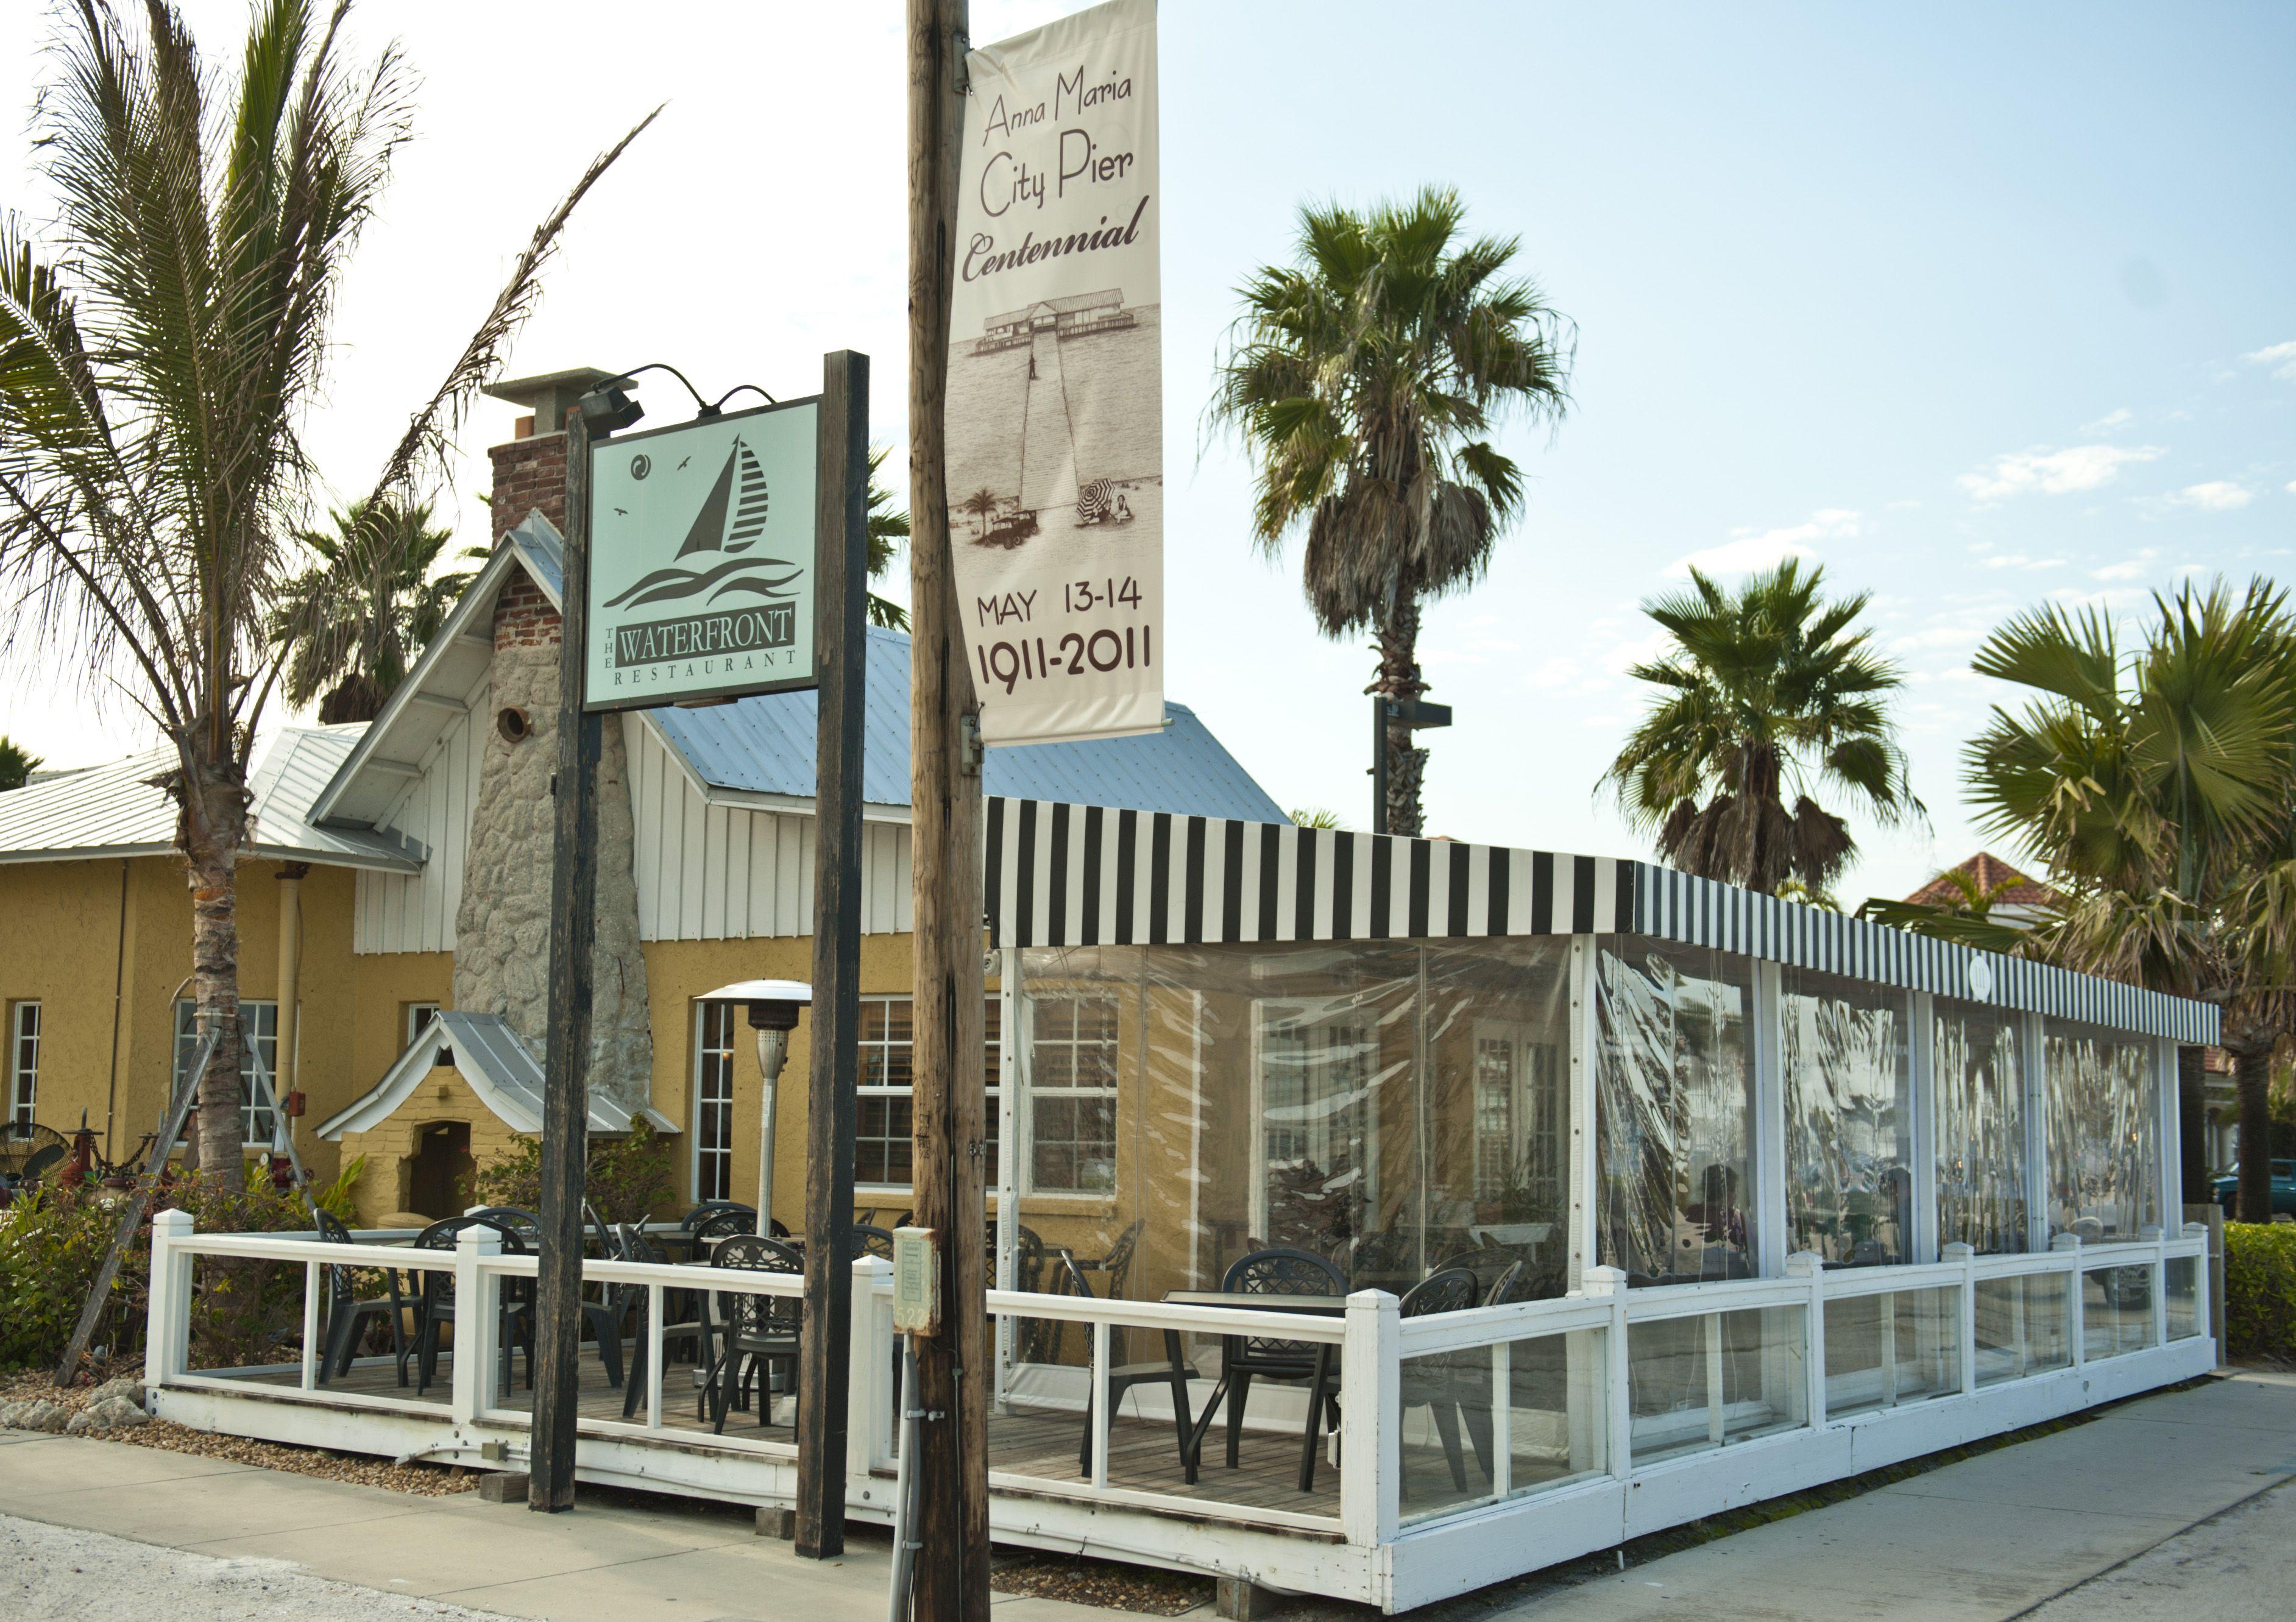 The Waterfront Restaurant Restaurantanna Maria Islandsunshine